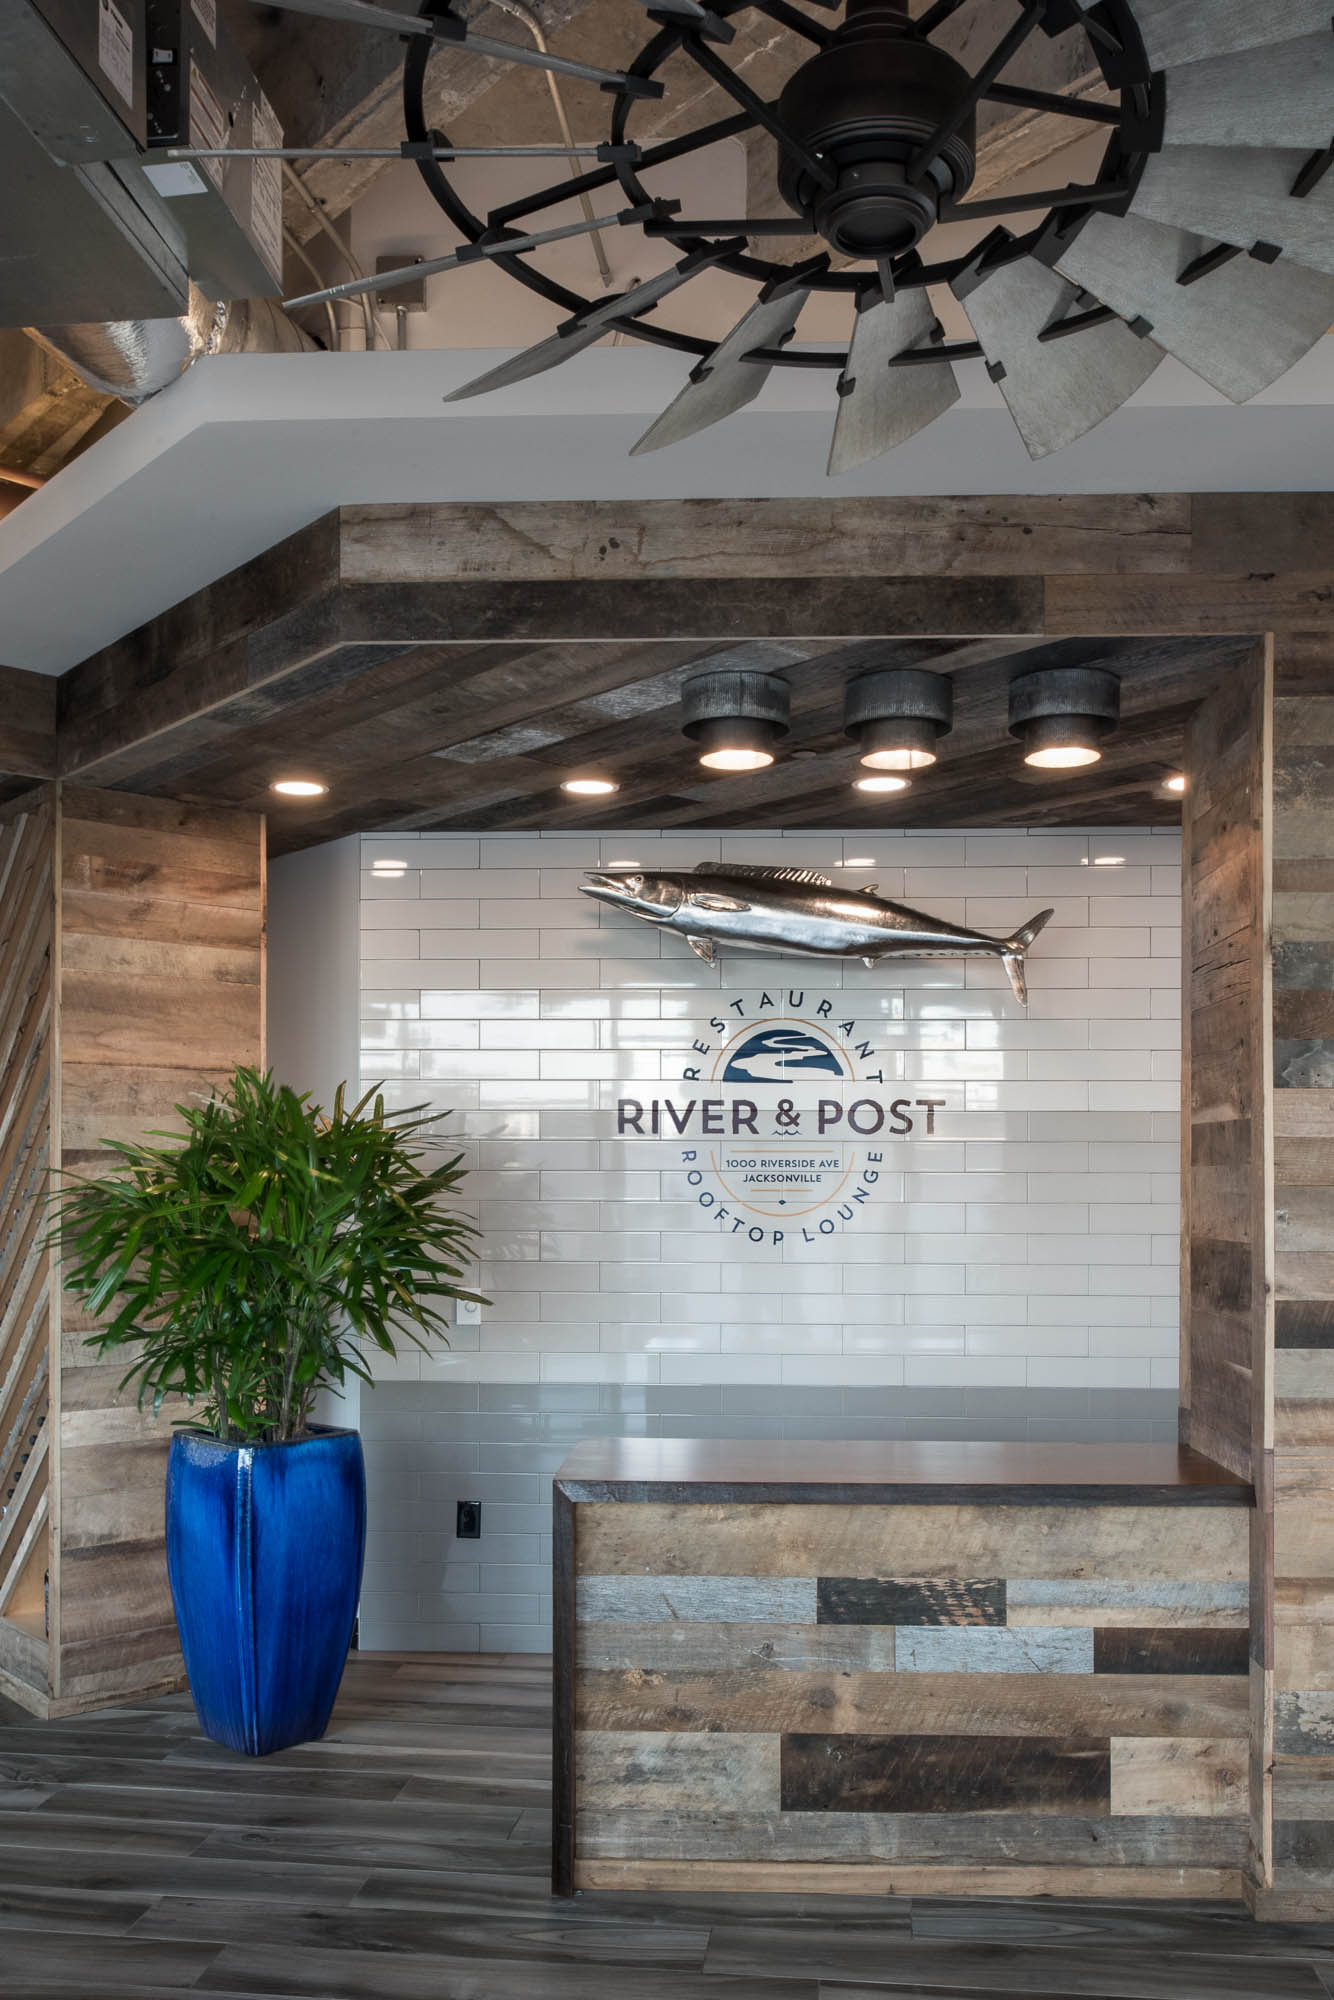 River and Post Restaurant Rooftop Lounge Jacksonville Florida Hostess Stand Entrance Commercial Interior Design reclaimed wood subway tile.jpg